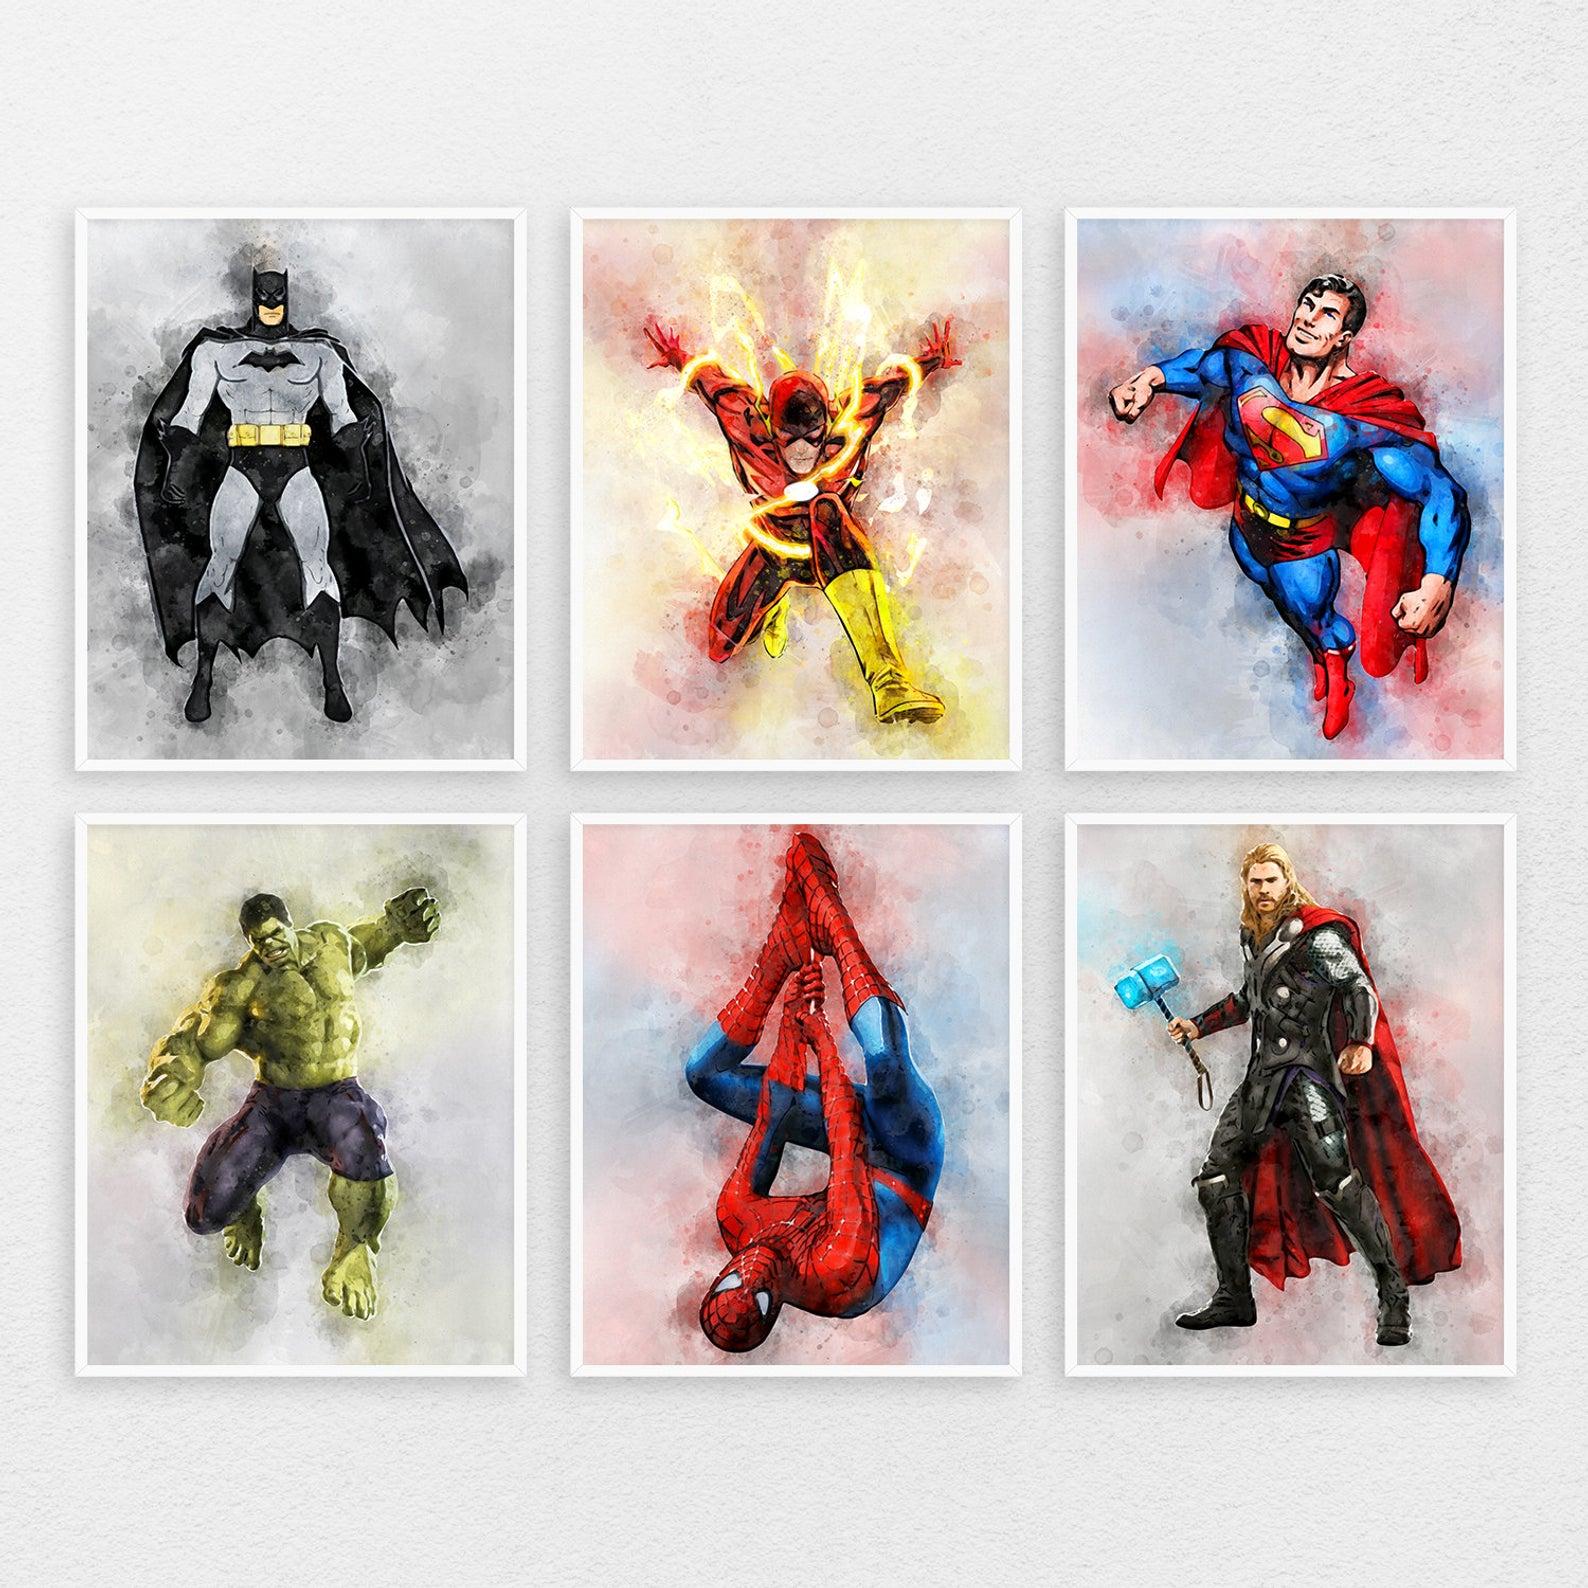 Superhero Print Set Of 6 Superhero Kids Room Posters Etsy Superhero Room Kids Room Poster Room Posters